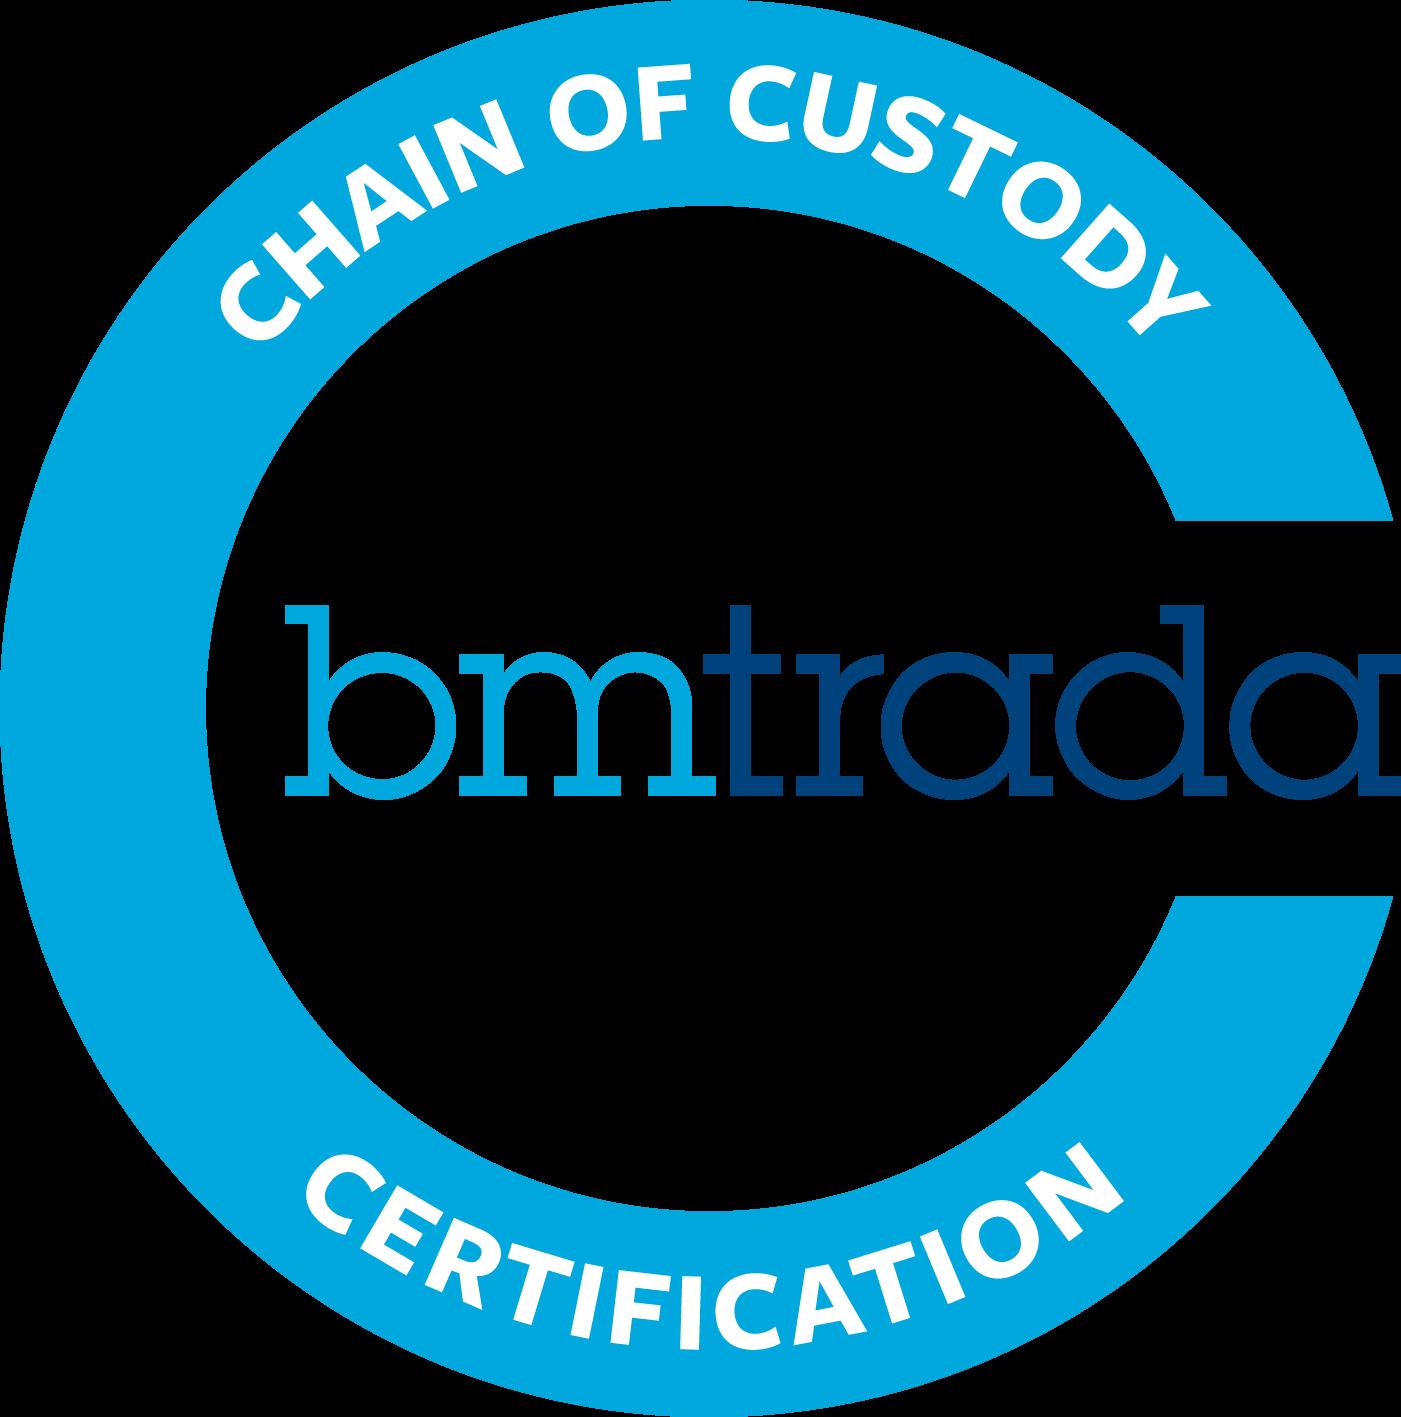 19085_BM-TRADA_C-Mark-CofC_Certification